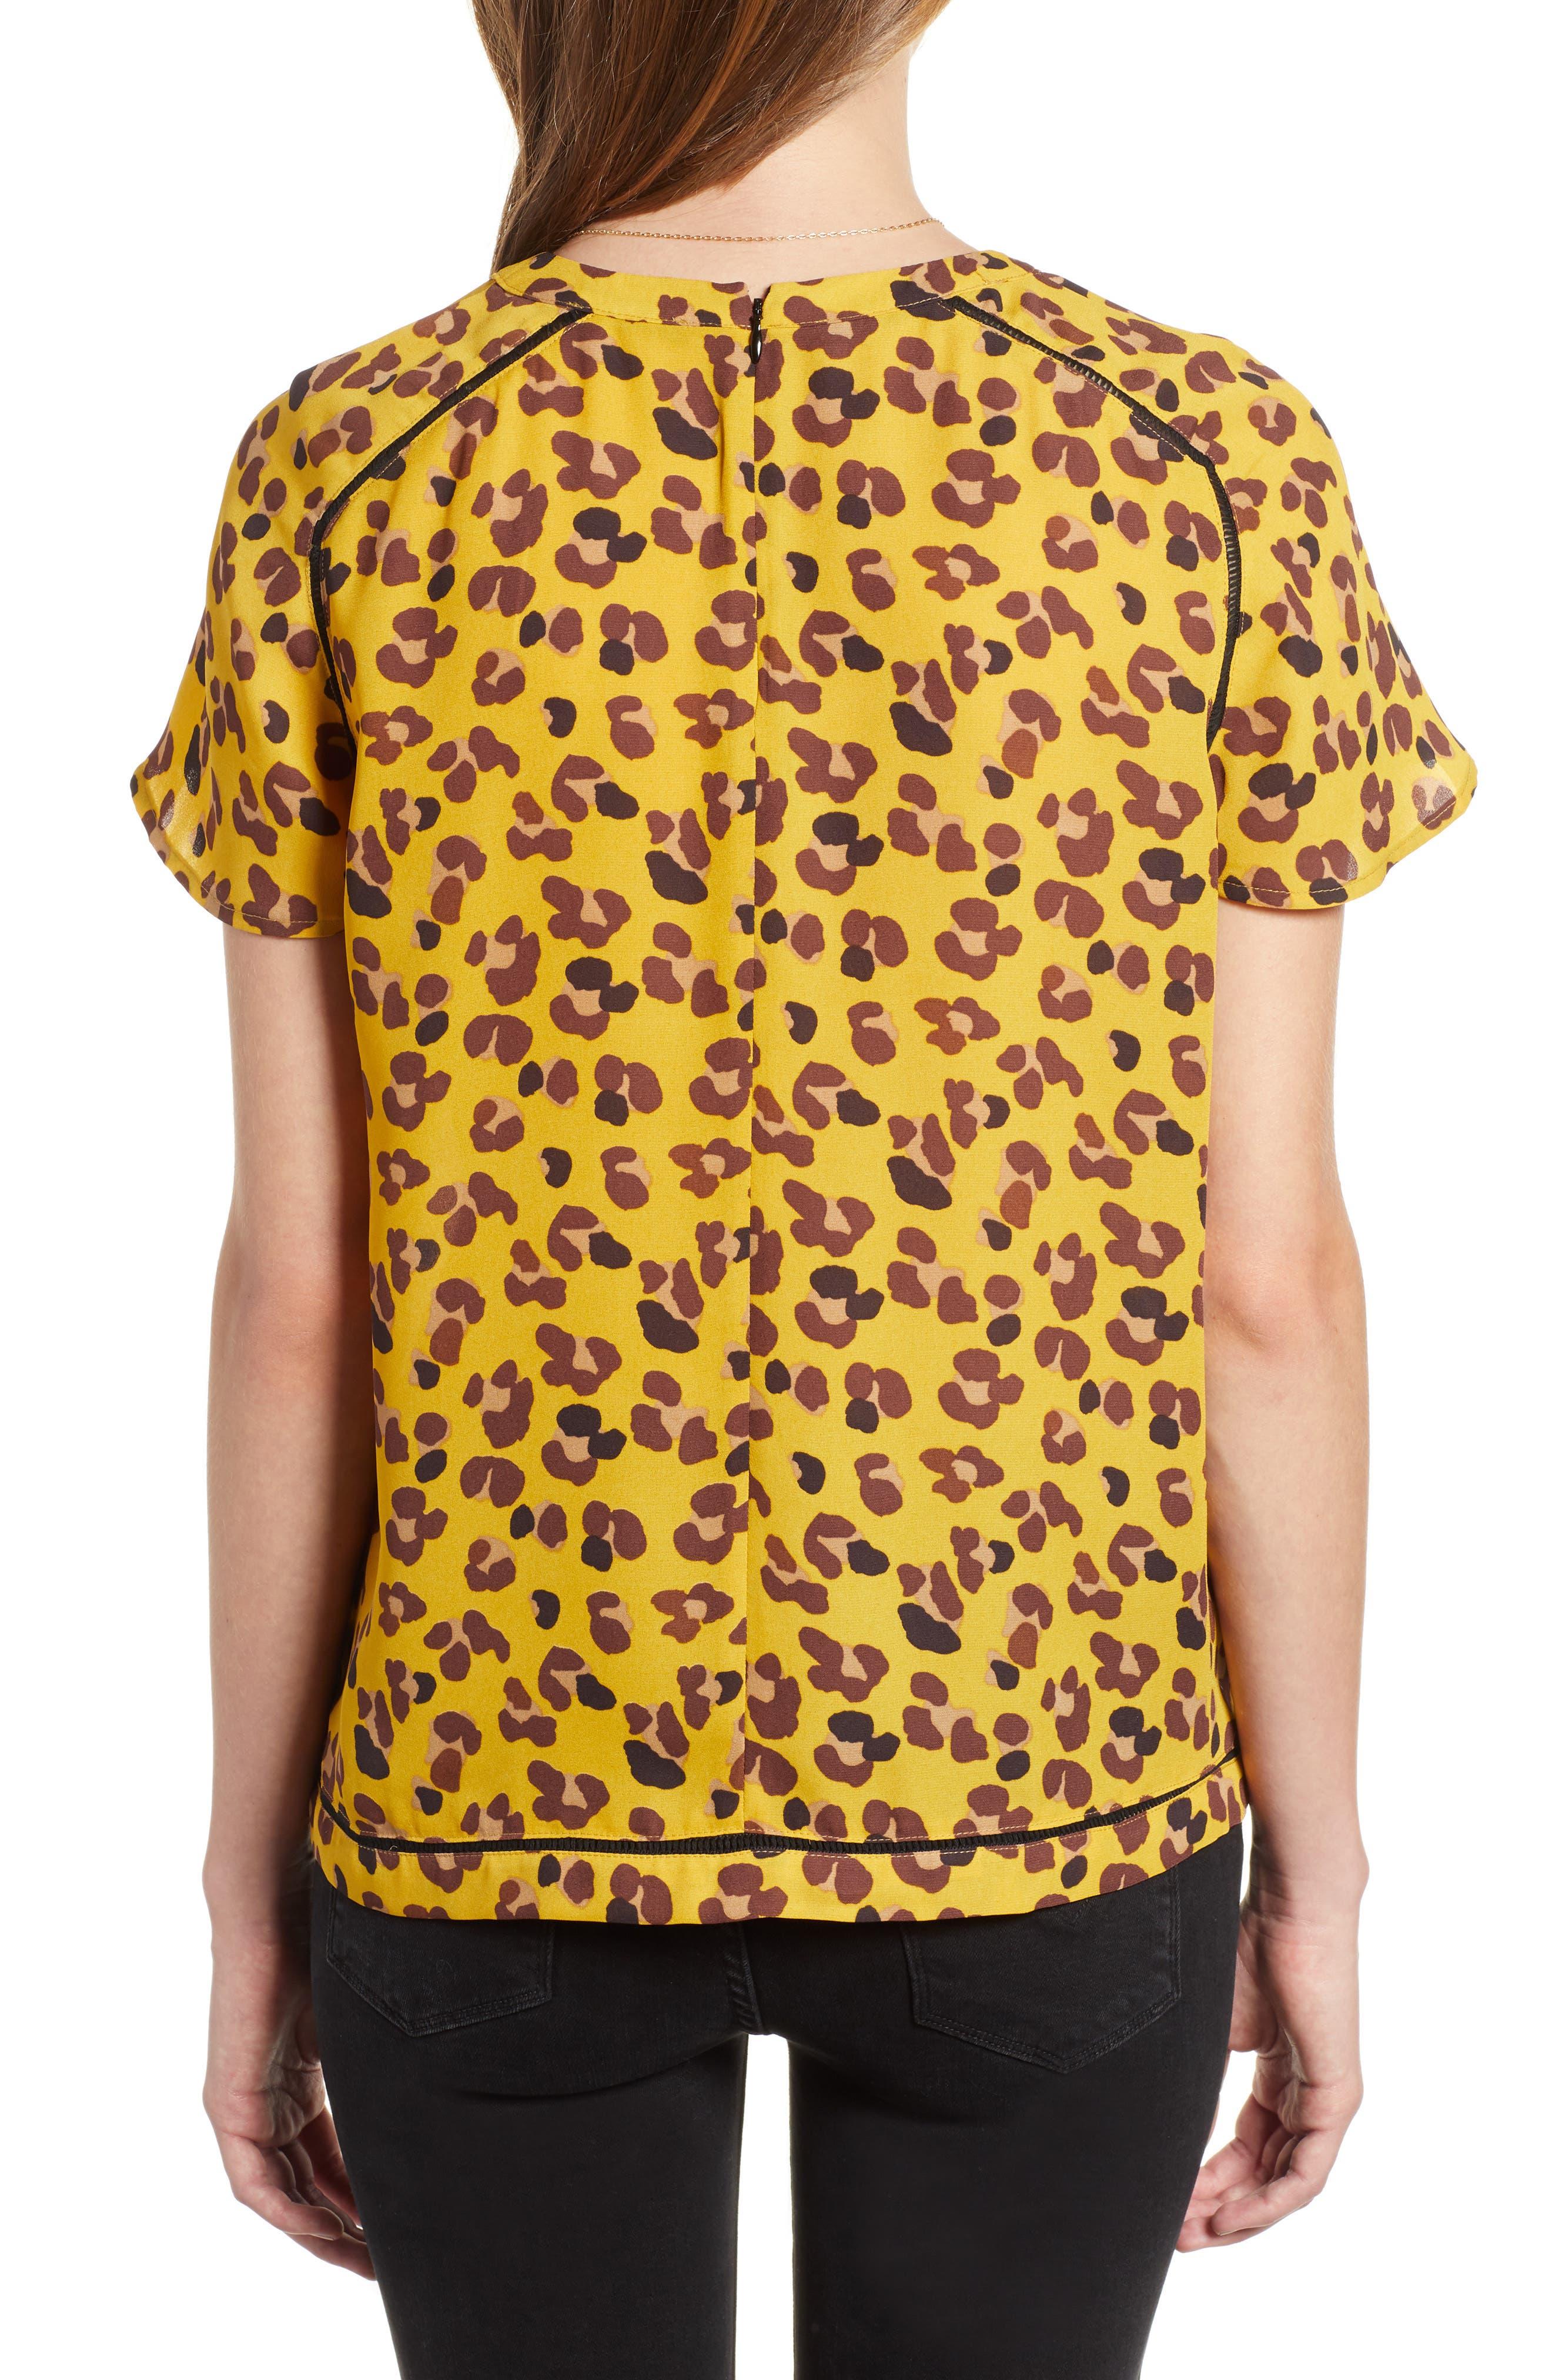 Leopard Print Top,                             Alternate thumbnail 2, color,                             YELLOW LEOPARD PRINT